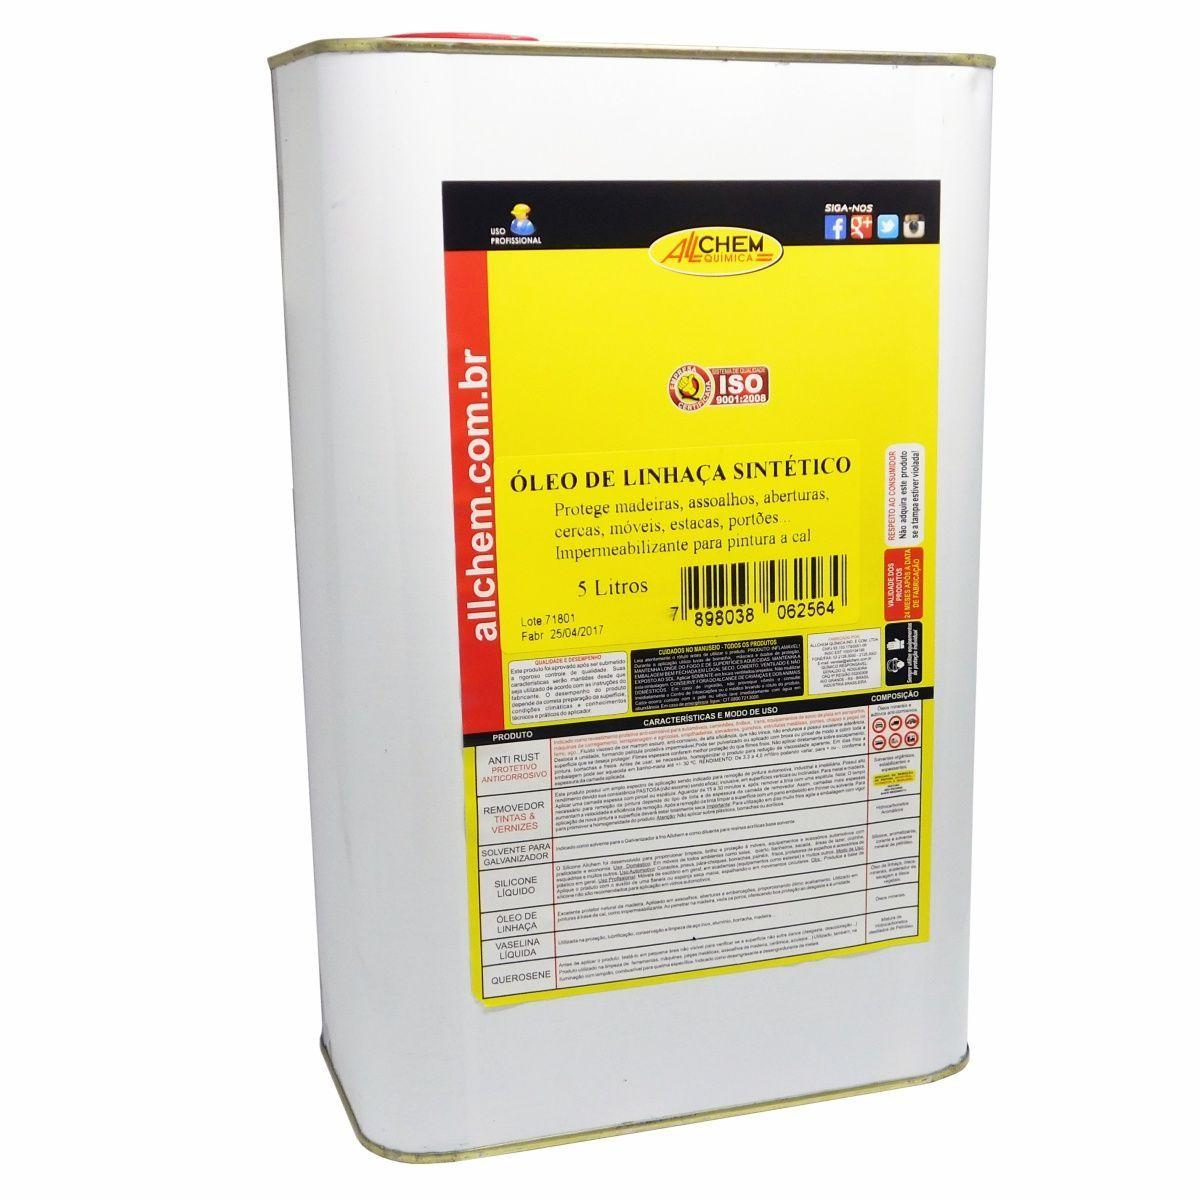 oleo-de-linhaca-sintetico-allchem